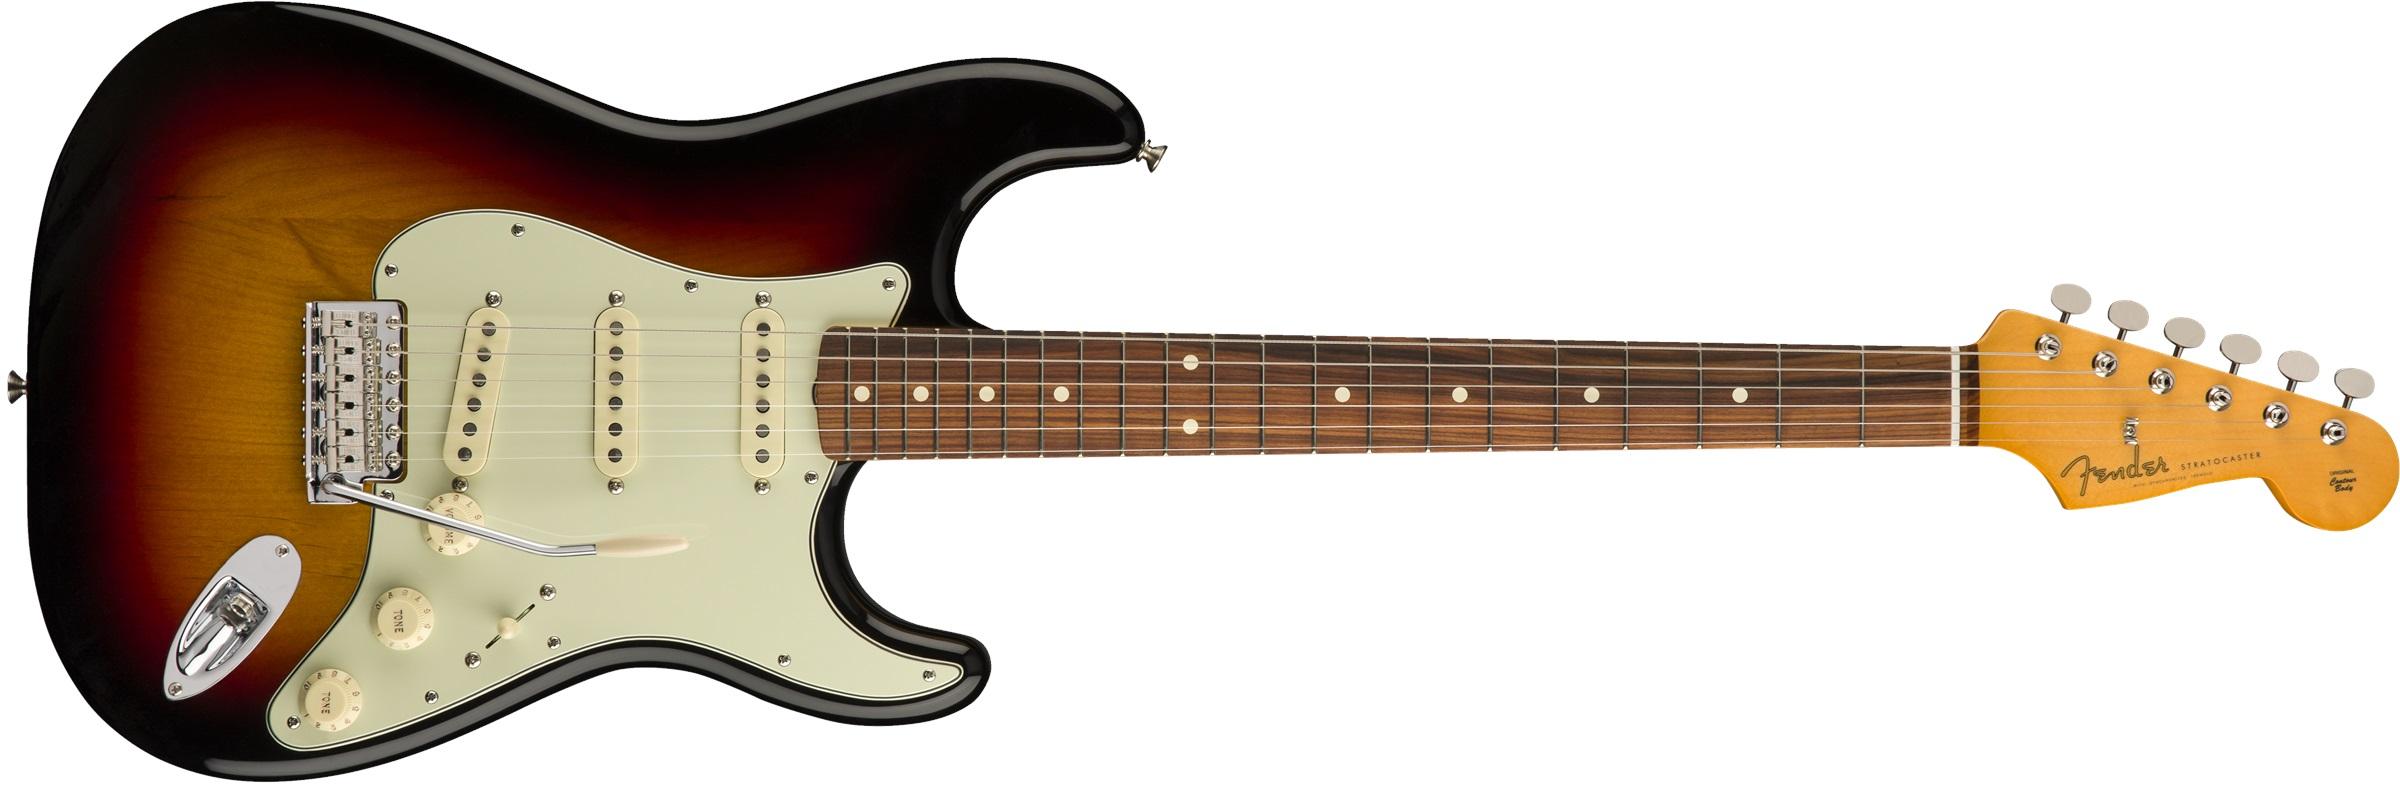 Fender 60s Stratocaster PF 3TSB Lacquer